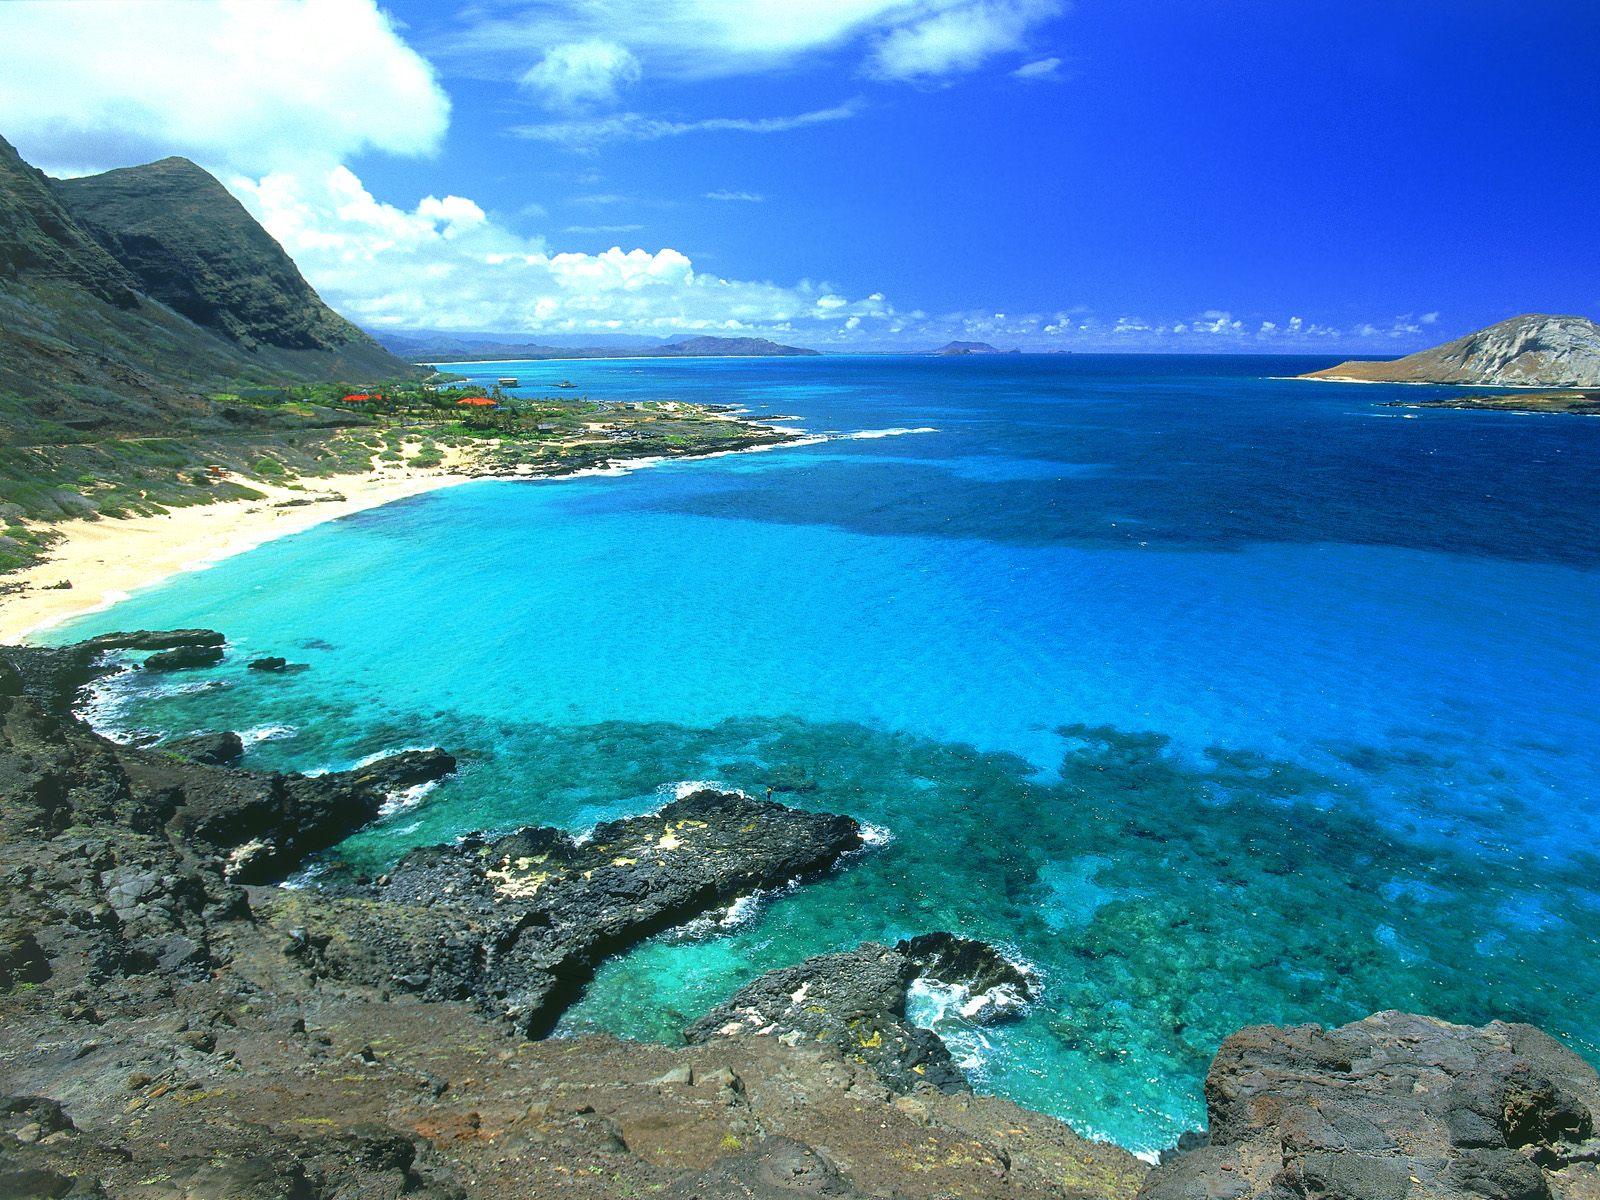 View from Makapuu, Oahu, Hawaii